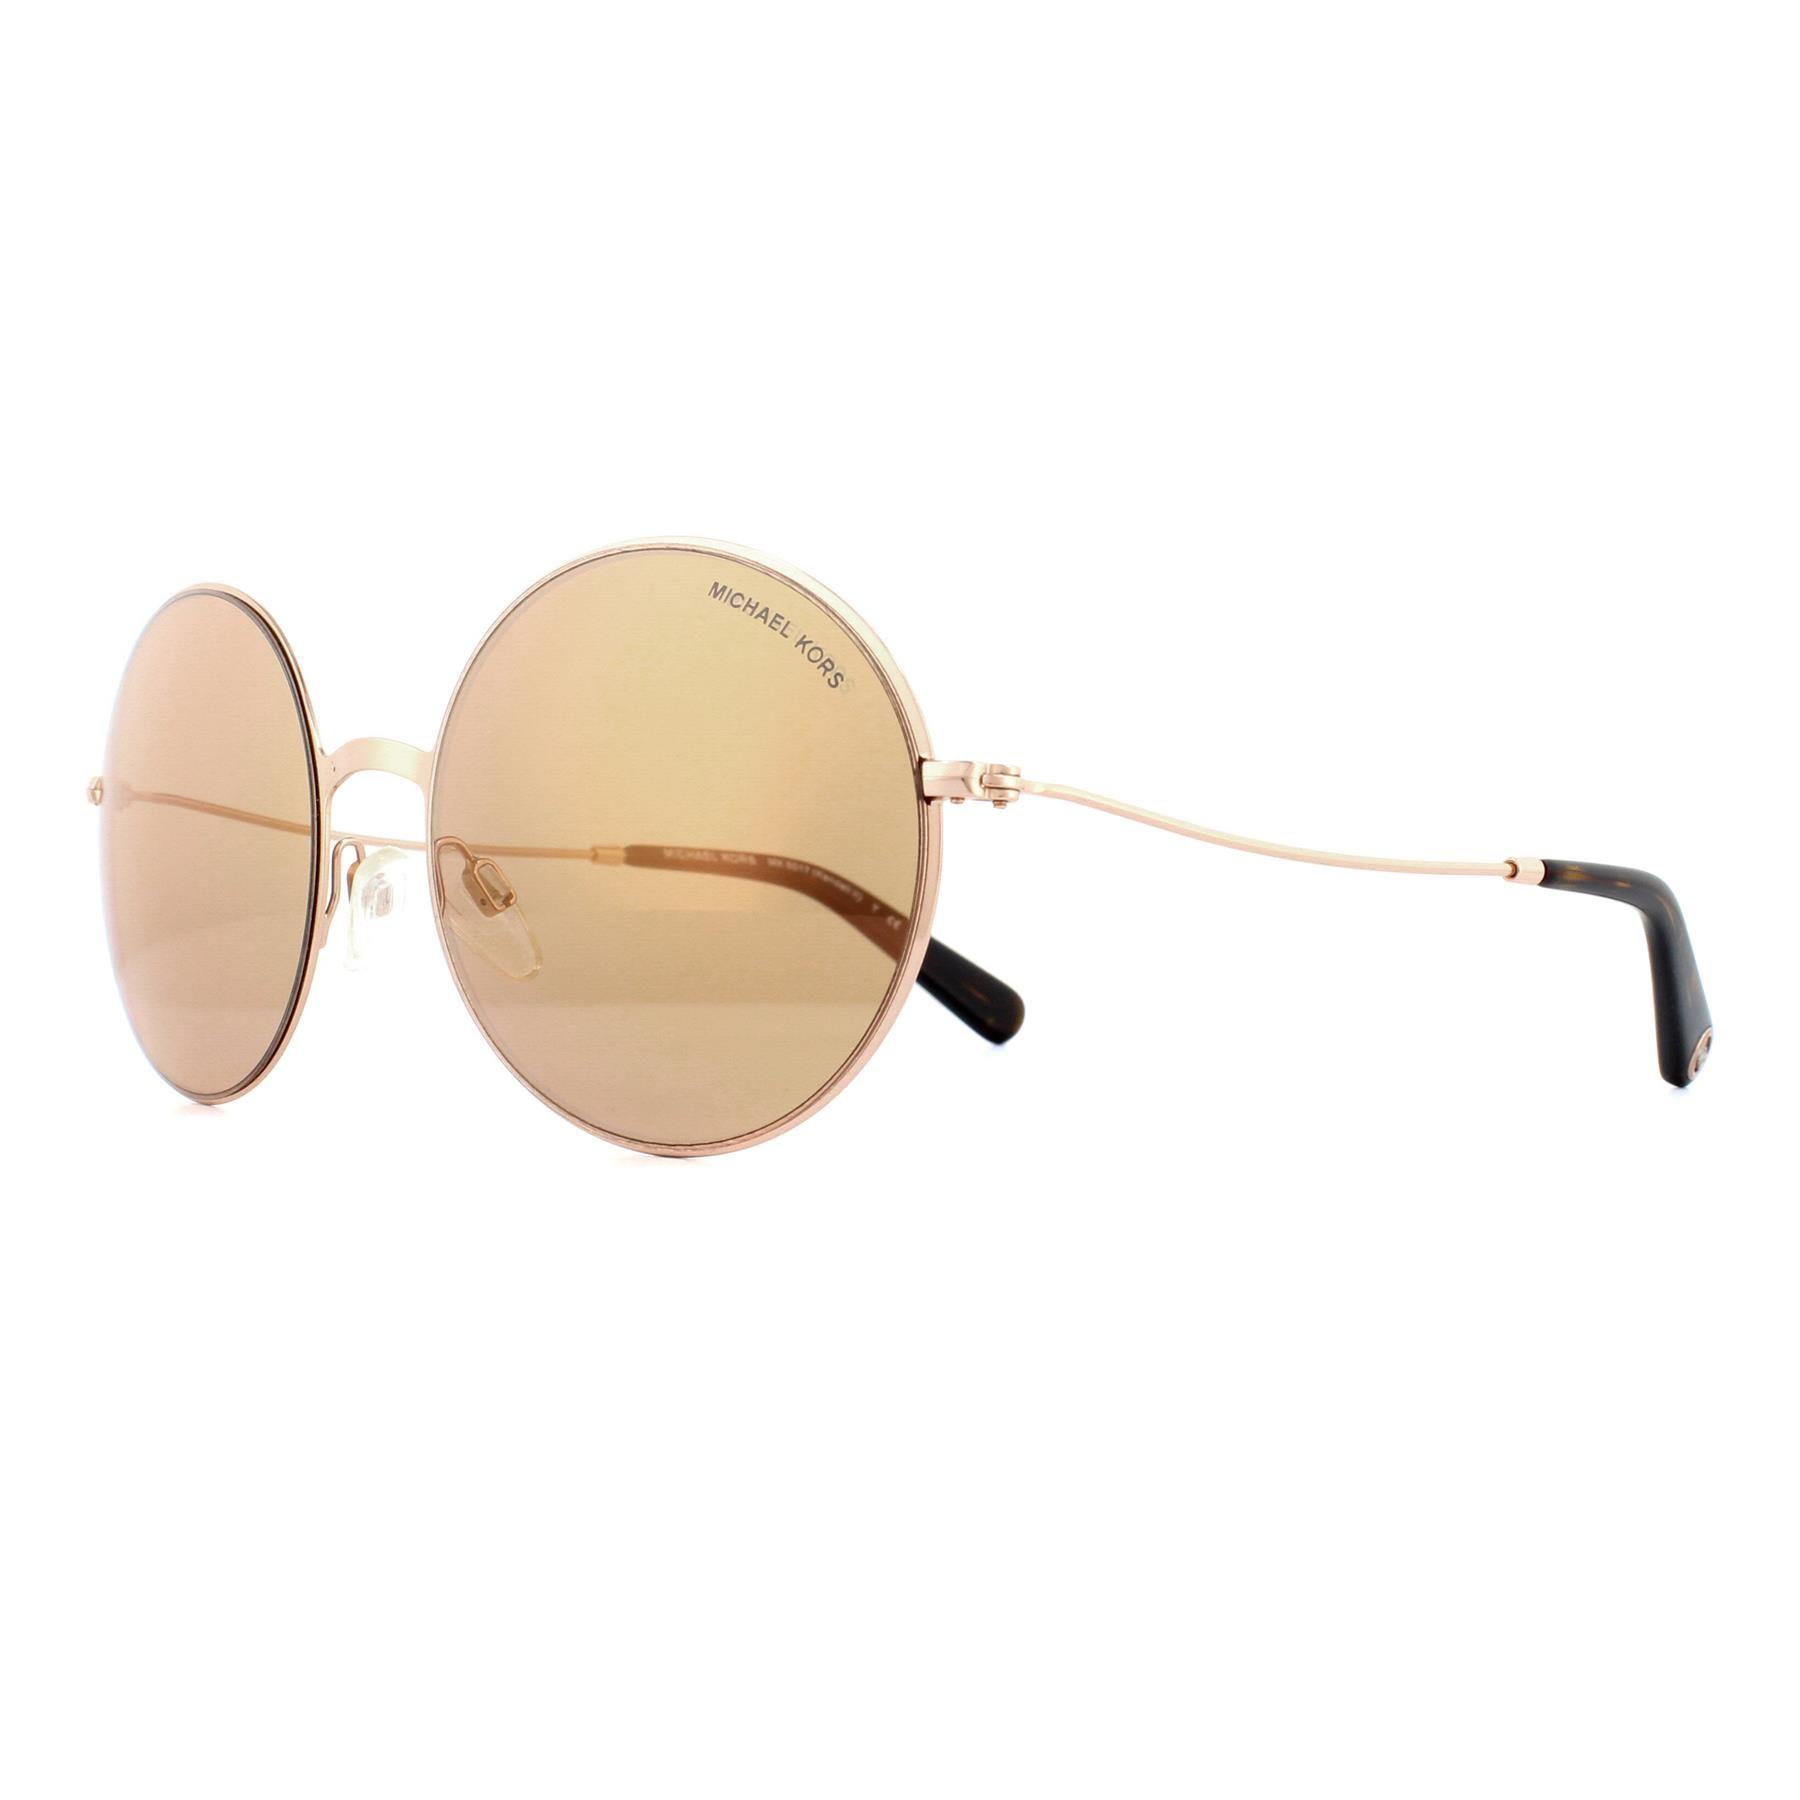 Michael Kors Sunglasses Kendall II 5017 1026R1 Rose Gold Rose Gold Flash